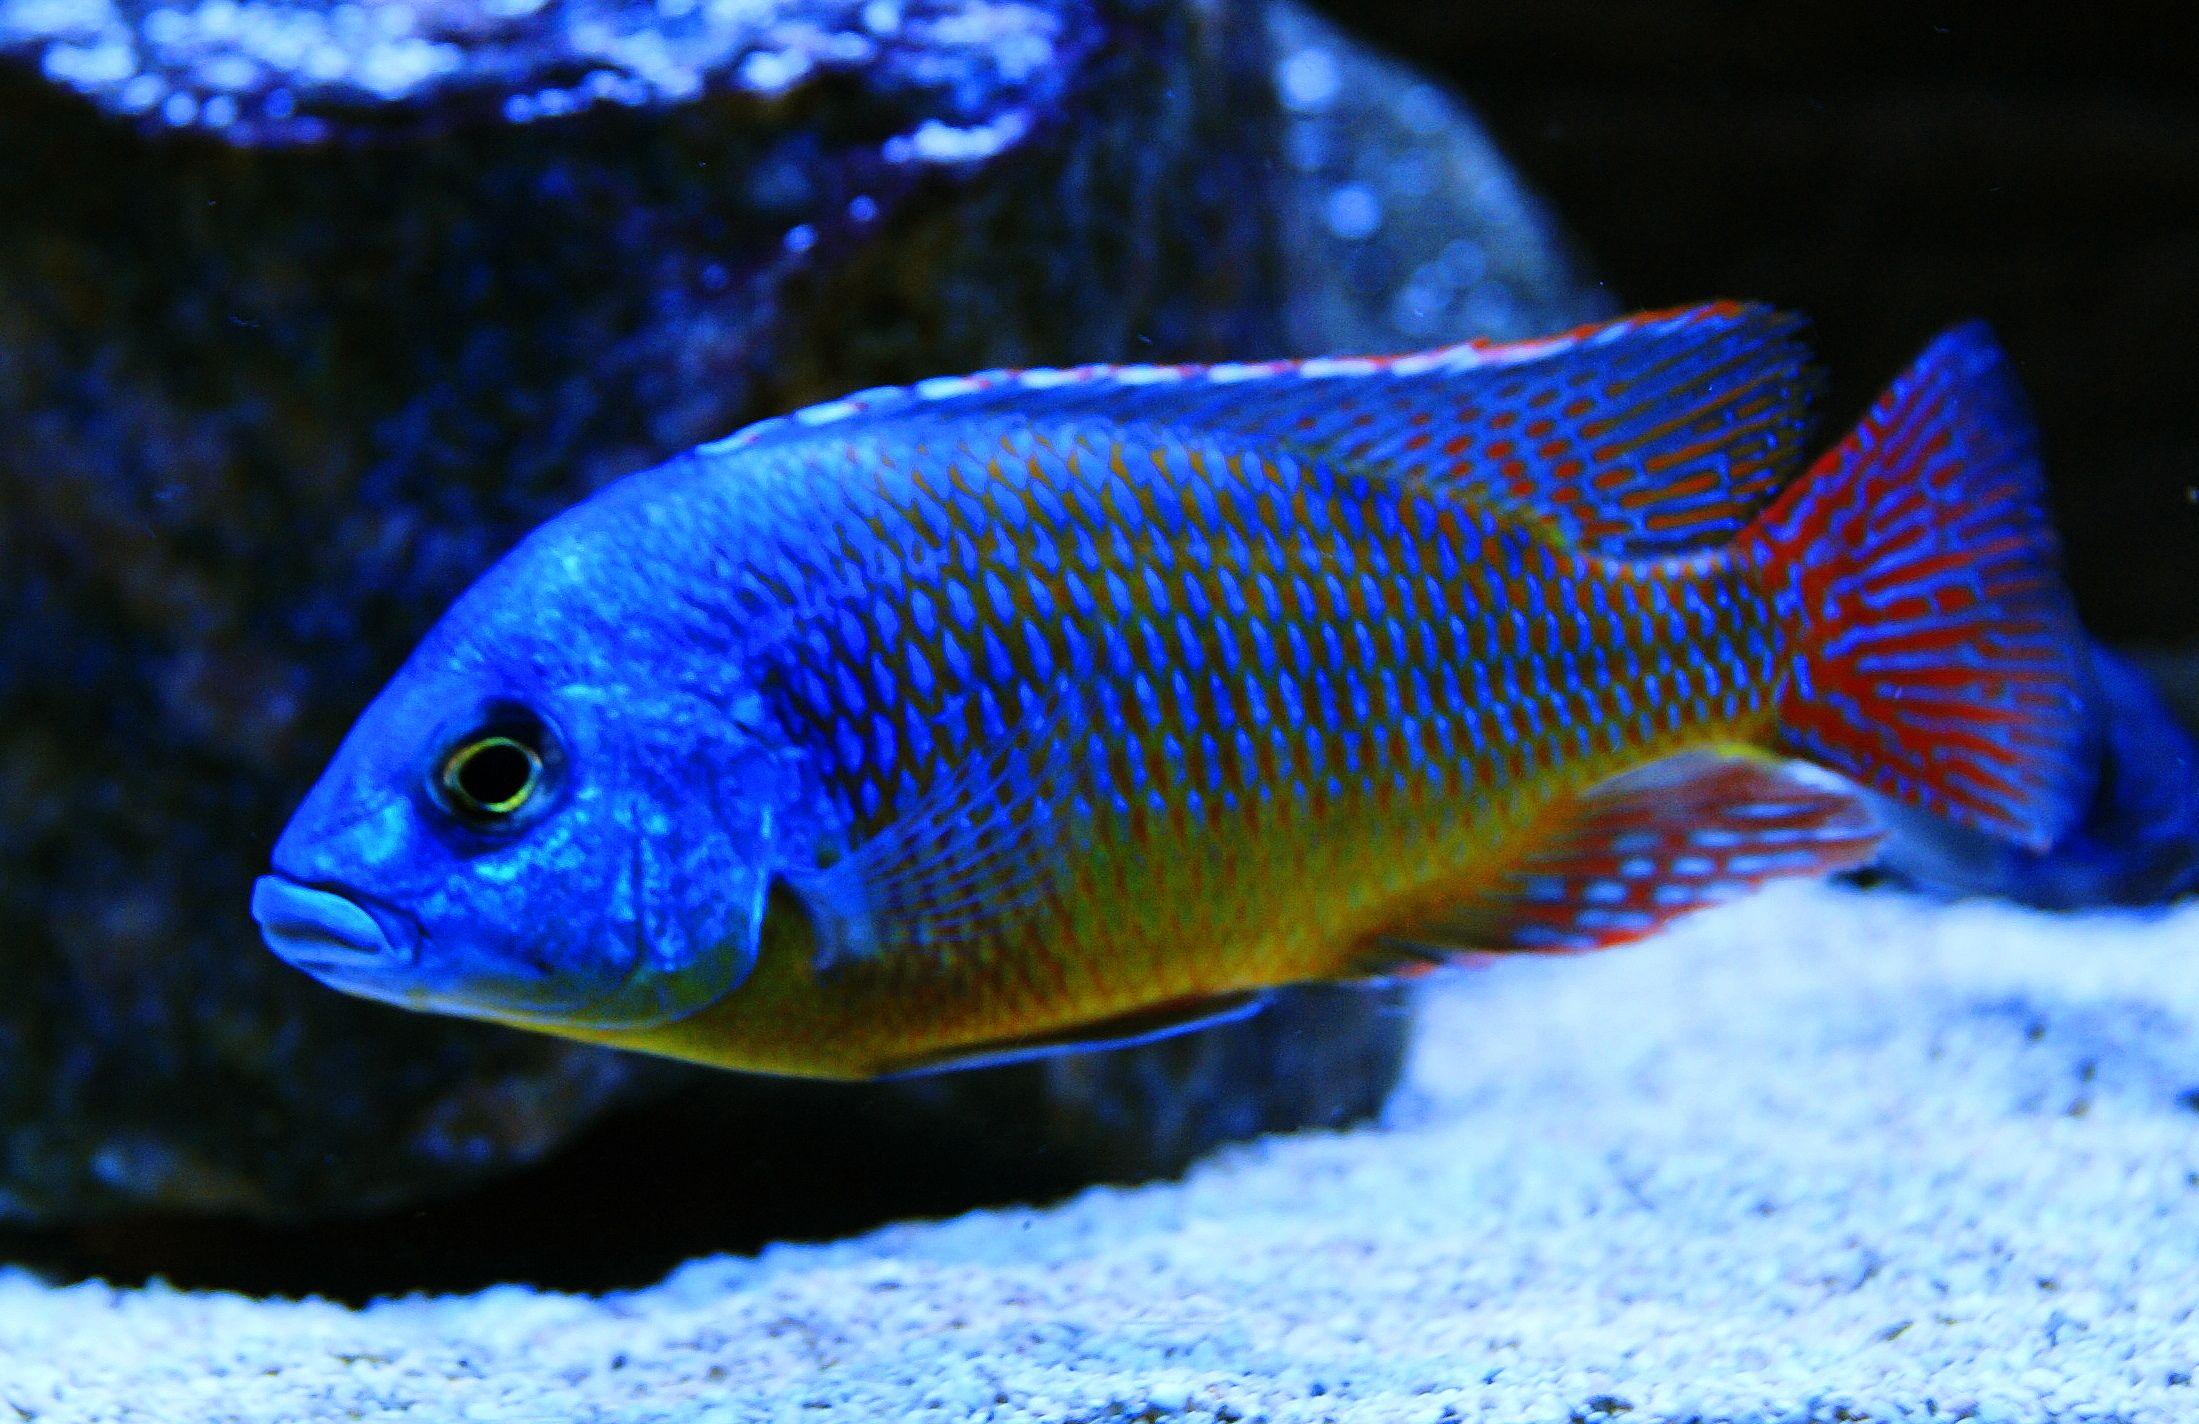 Protomelas Taeniolatus Red Empress Cichlid Protomelas Taeniolatus Red Super Red Empress Cichlid Cichlids Aquarium Fish Malawi Cichlids